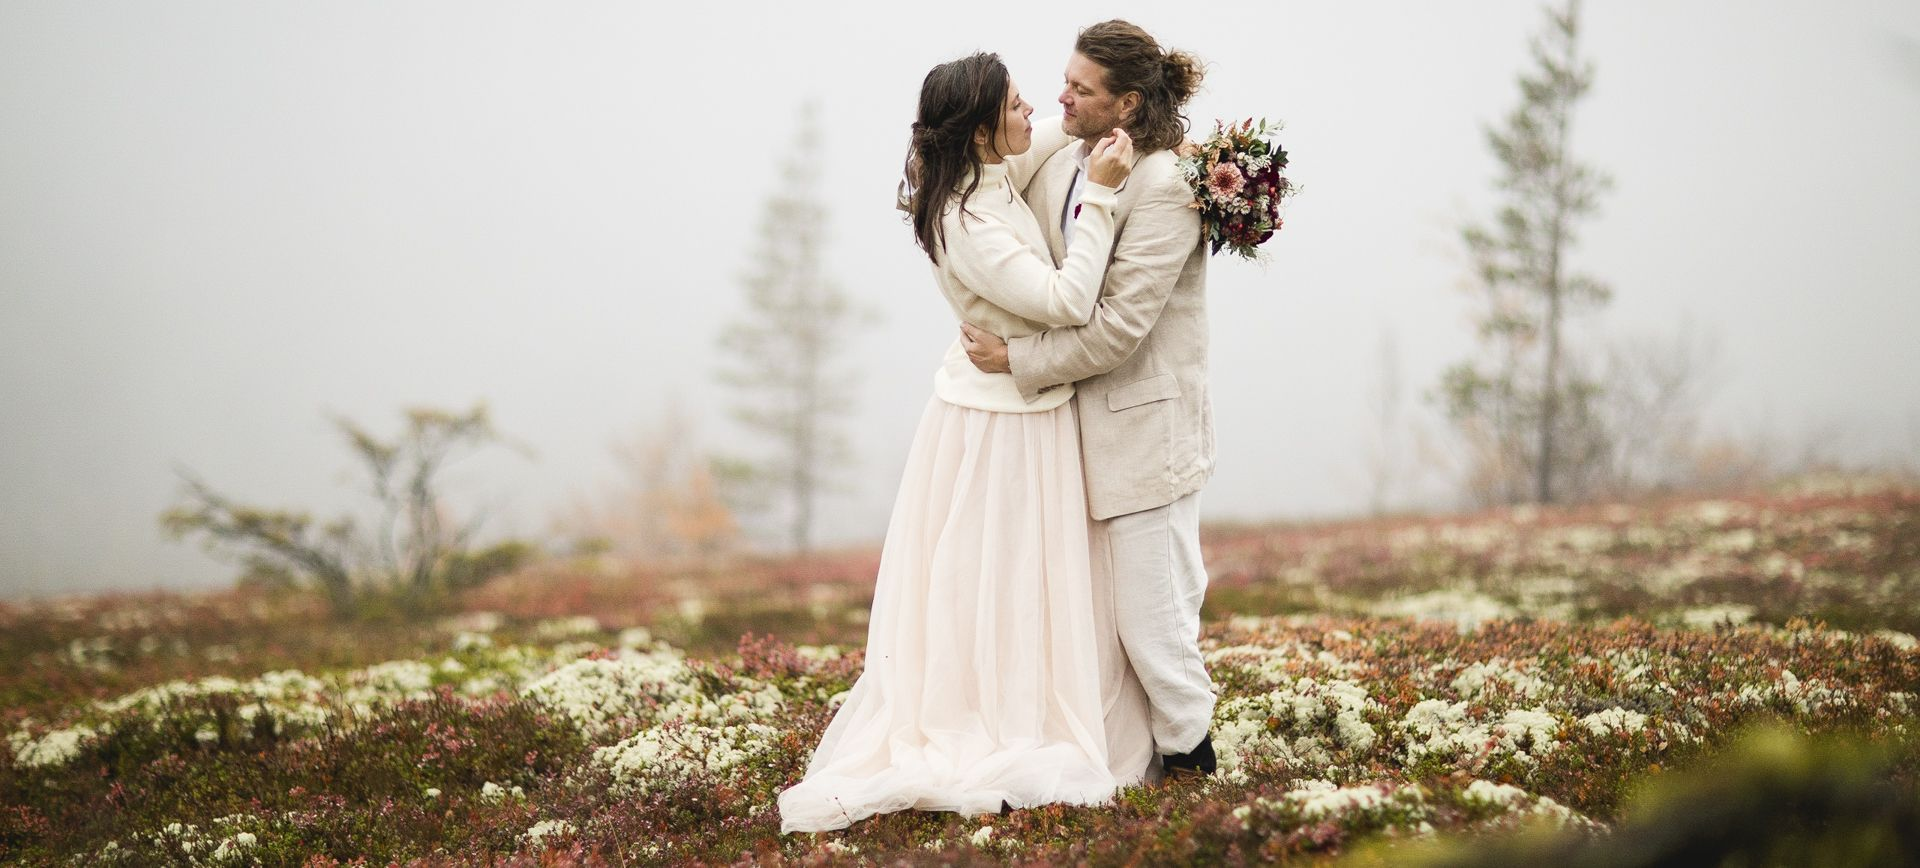 fulufjället glamping wedding at a waterfall